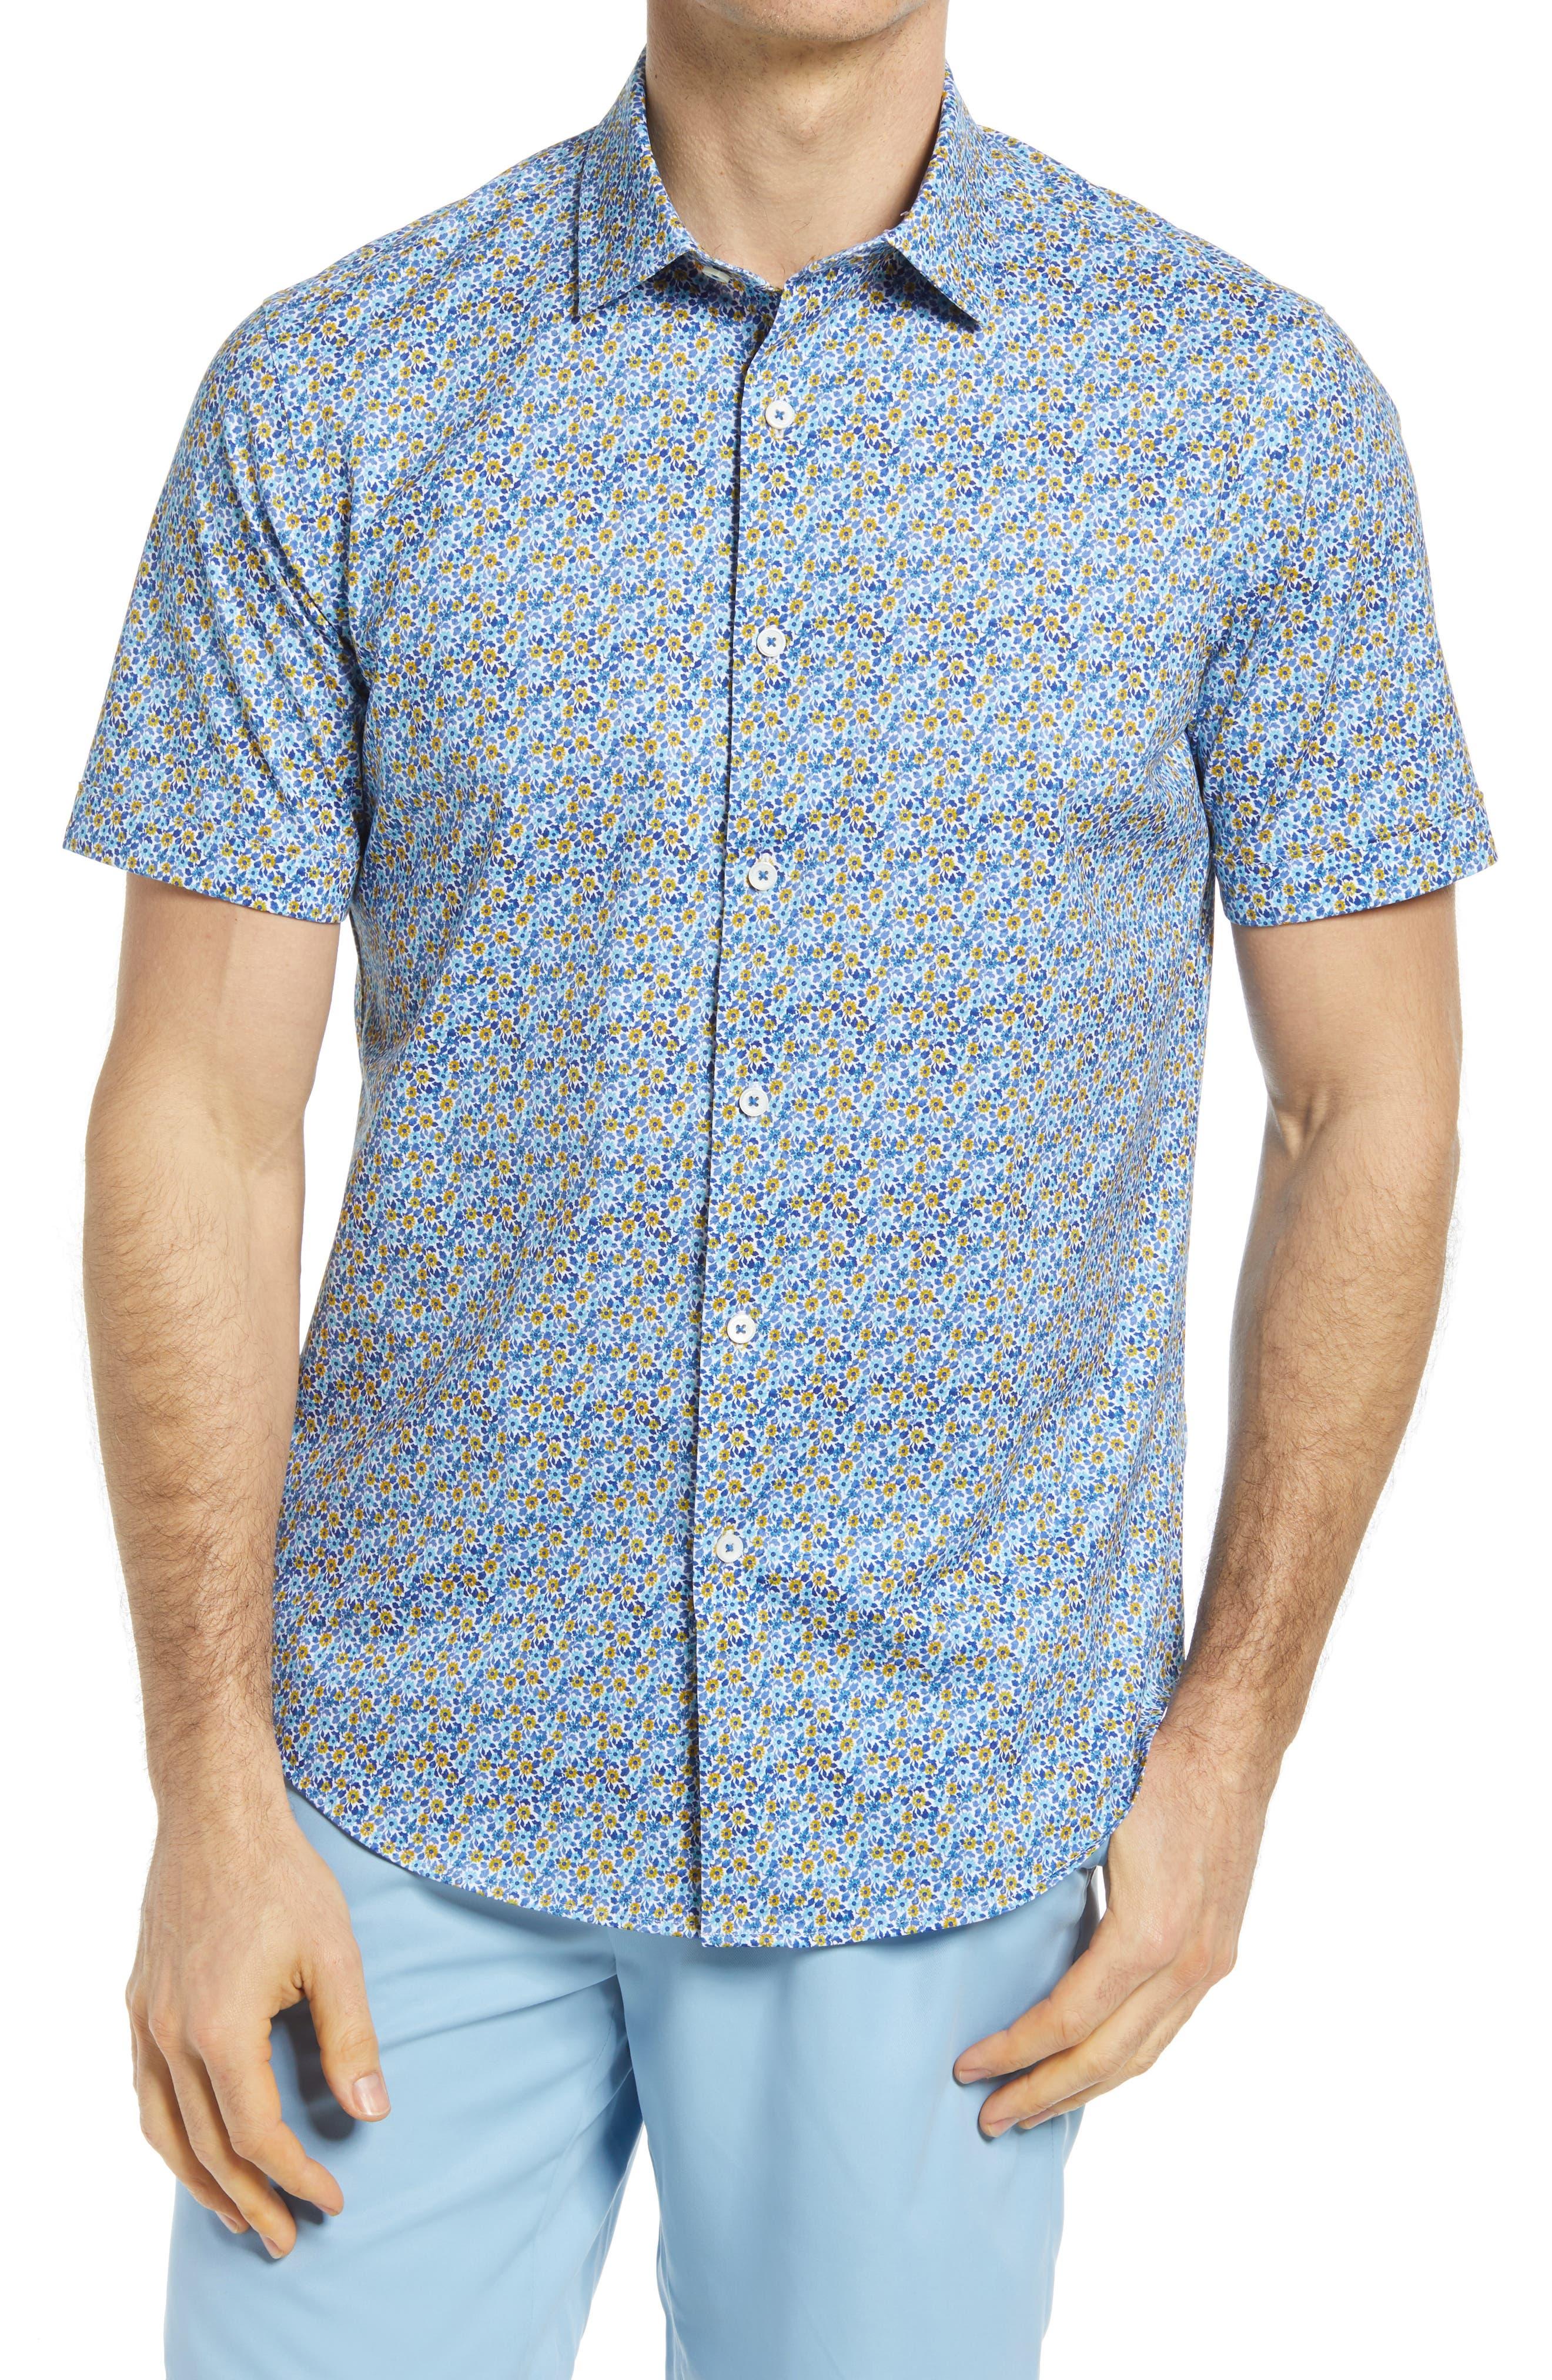 Ooohcotton Stretch Floral Short Sleeve Button-Up Shirt